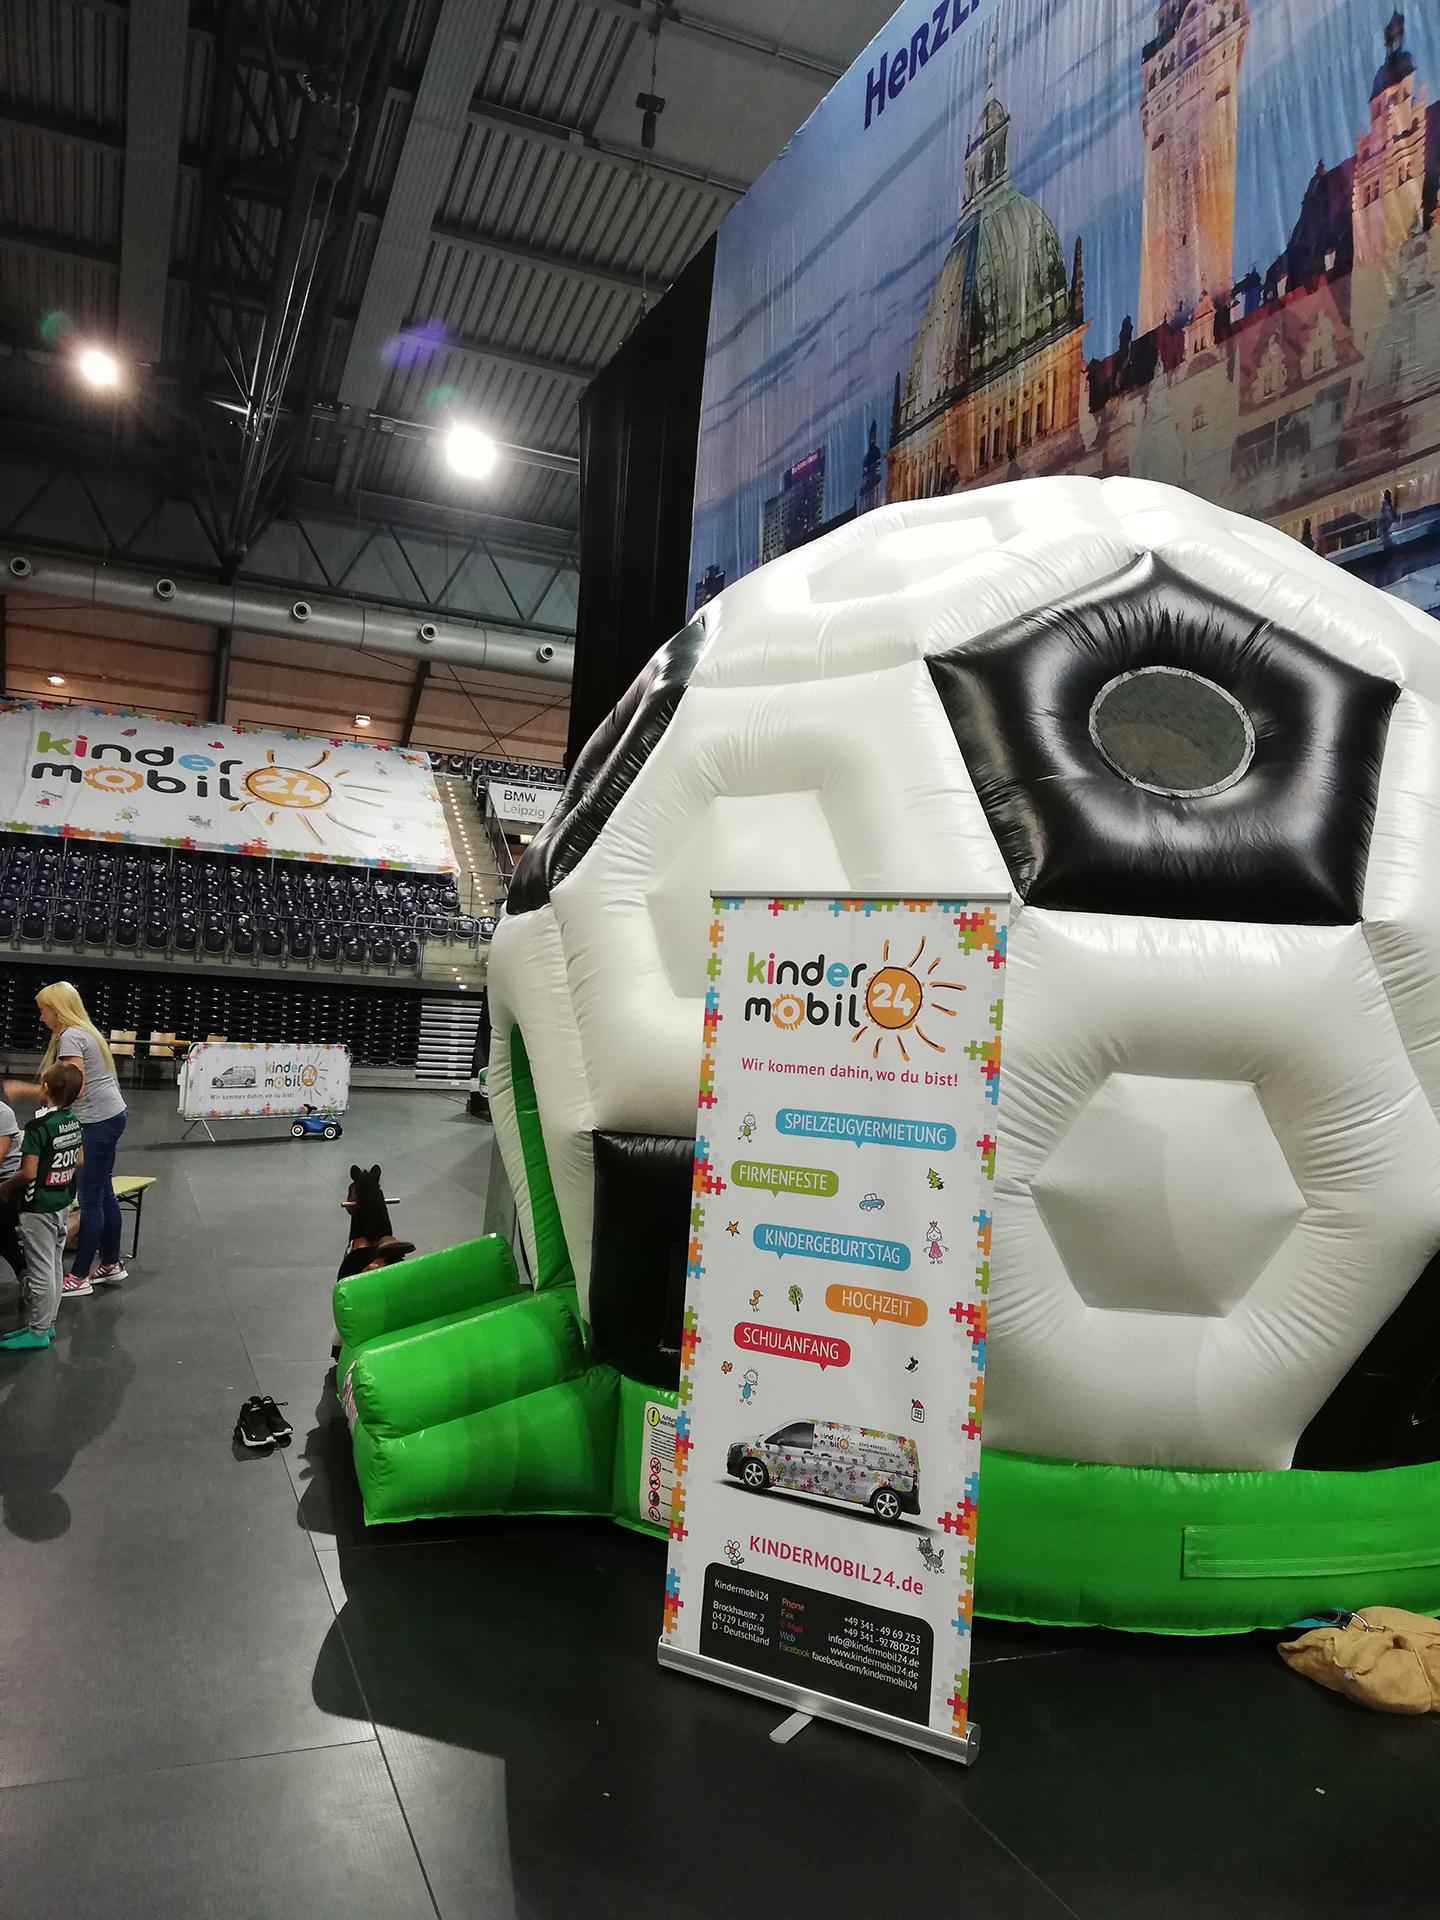 Kindermobil24 mit Fussballhüpfburg beim SC DHfK Handball Leipzig